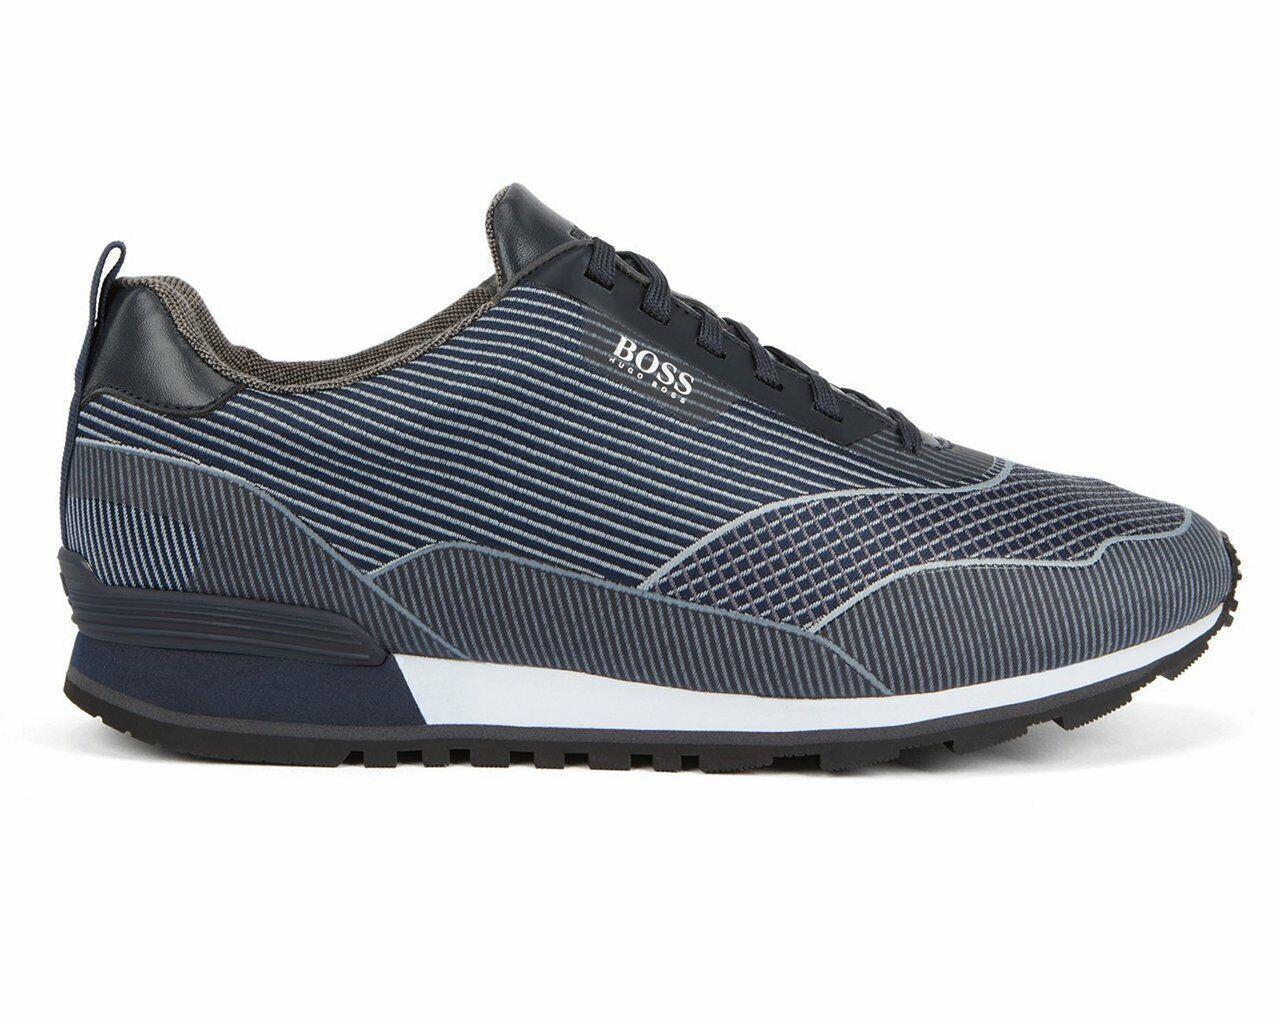 Sale Hugo Boss Zephir Runn jacq 50401841 401 Nylon Trainers Dark bluee RRP